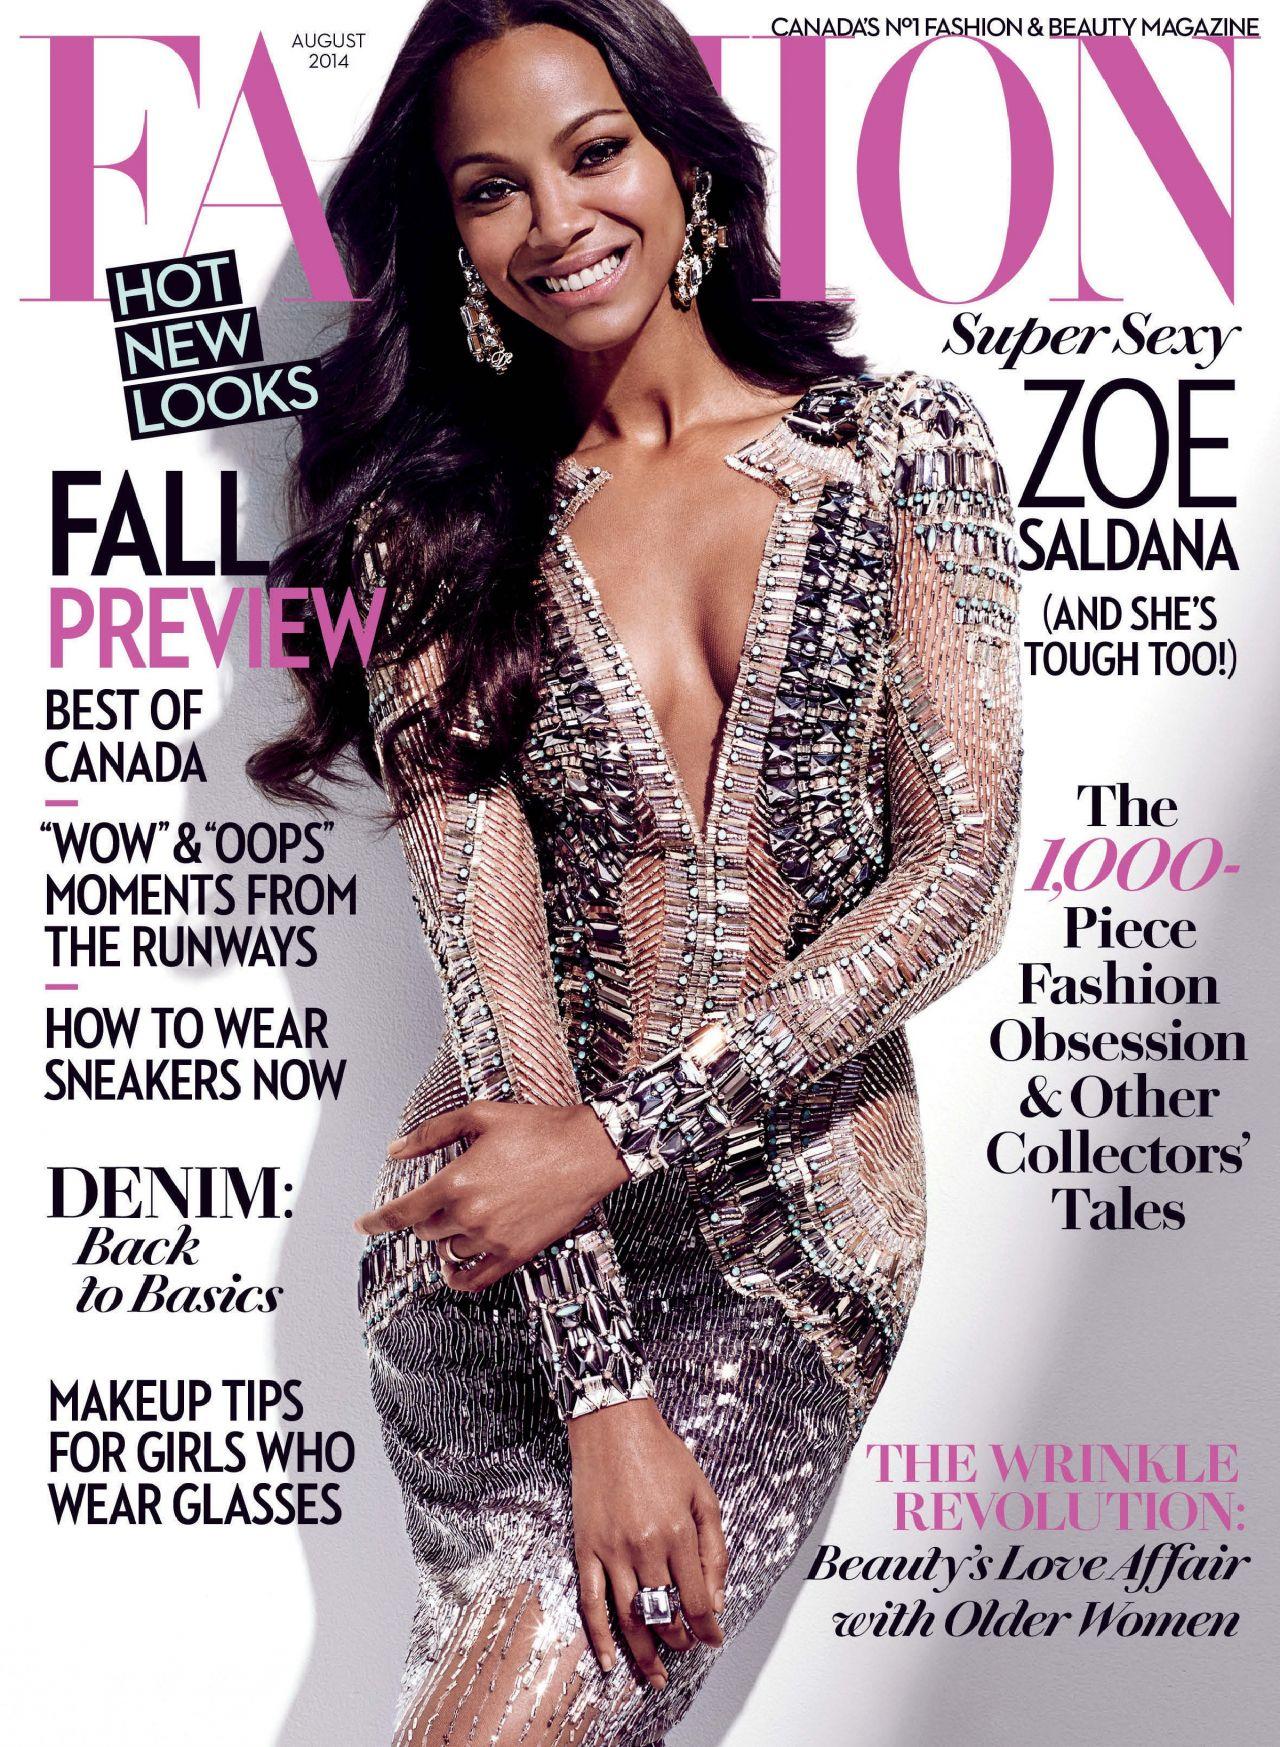 zoe-saldana-fashion-magazine-canada-august-2014-cover_1